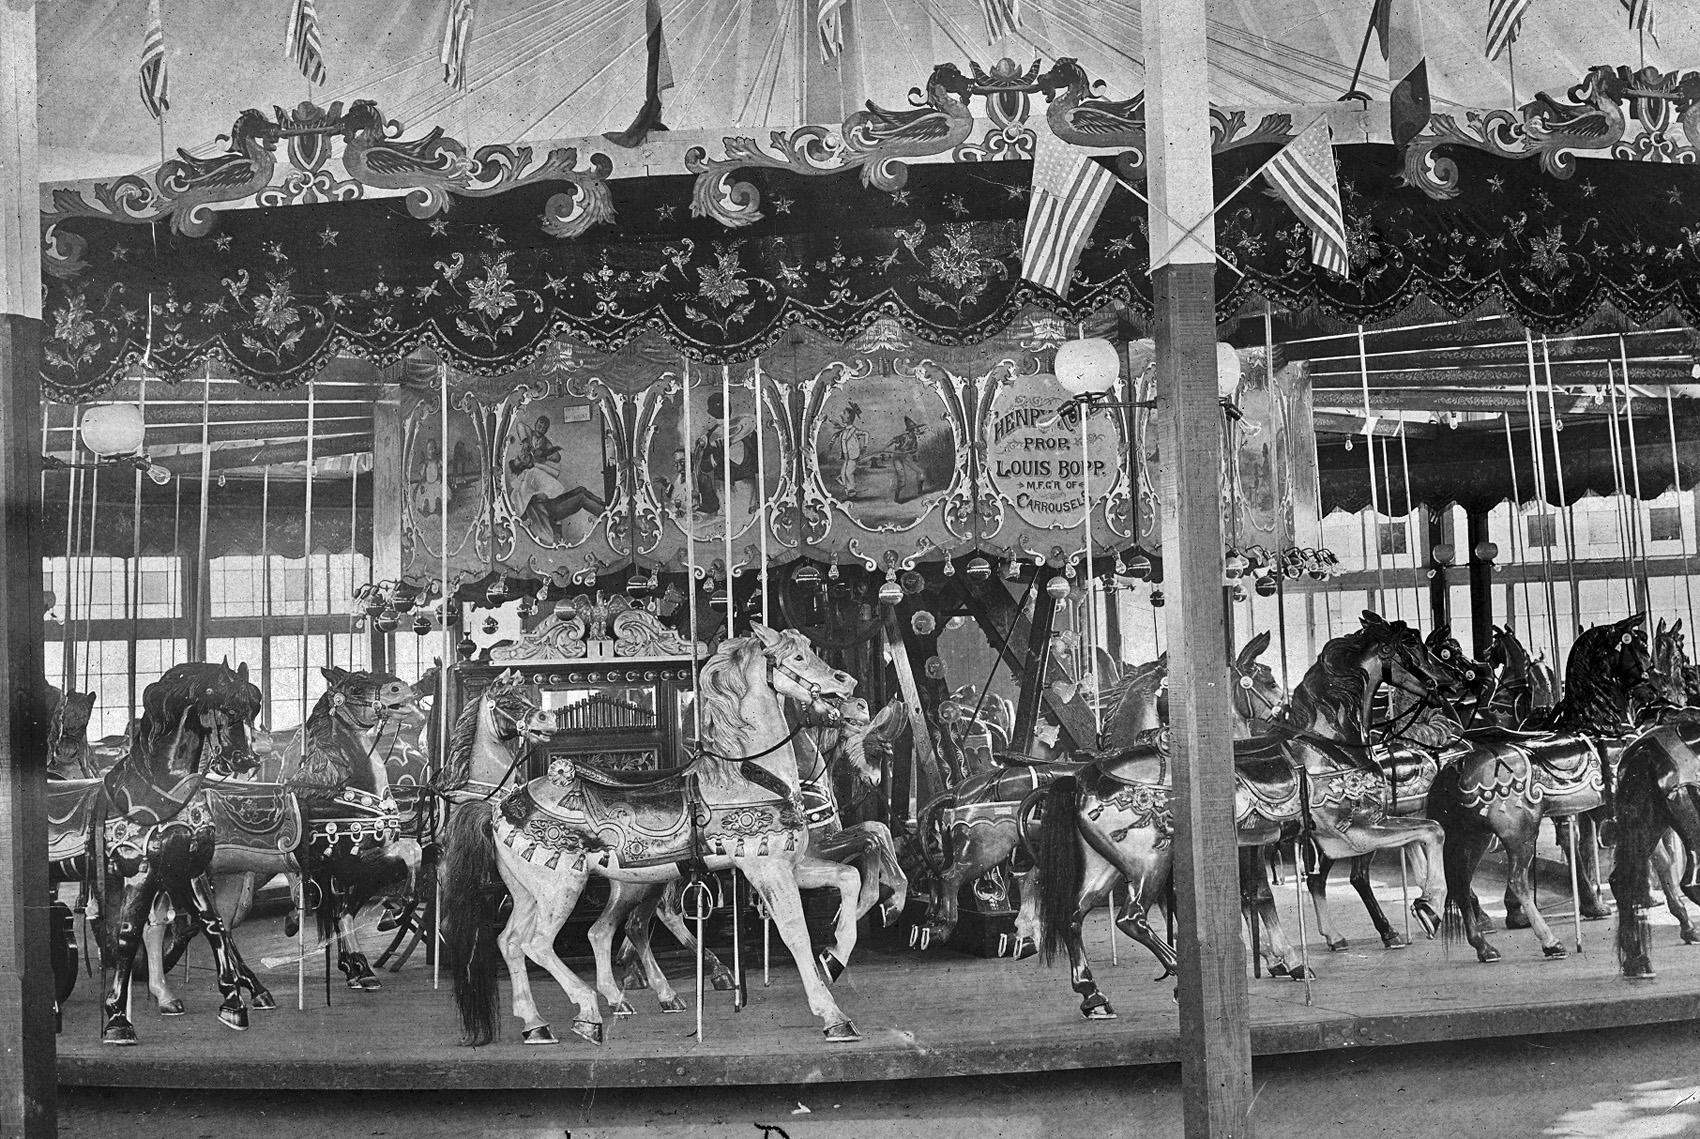 1890s-Sulzers-Louis-Bopp-Carousel-Harlem-River-Park-Looff-horses